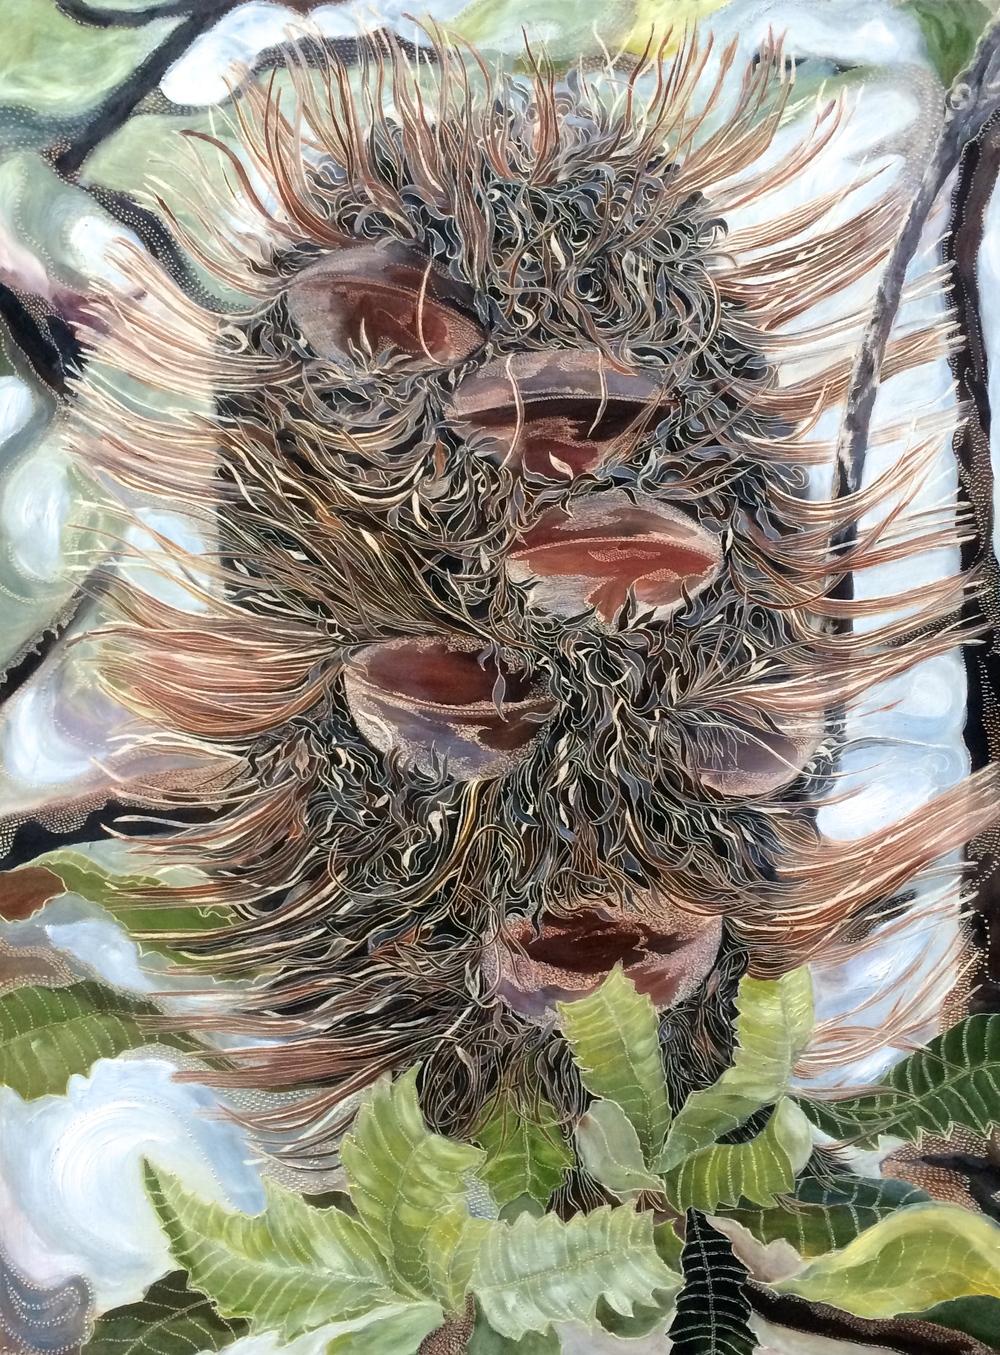 Homage to Old Man Banksia